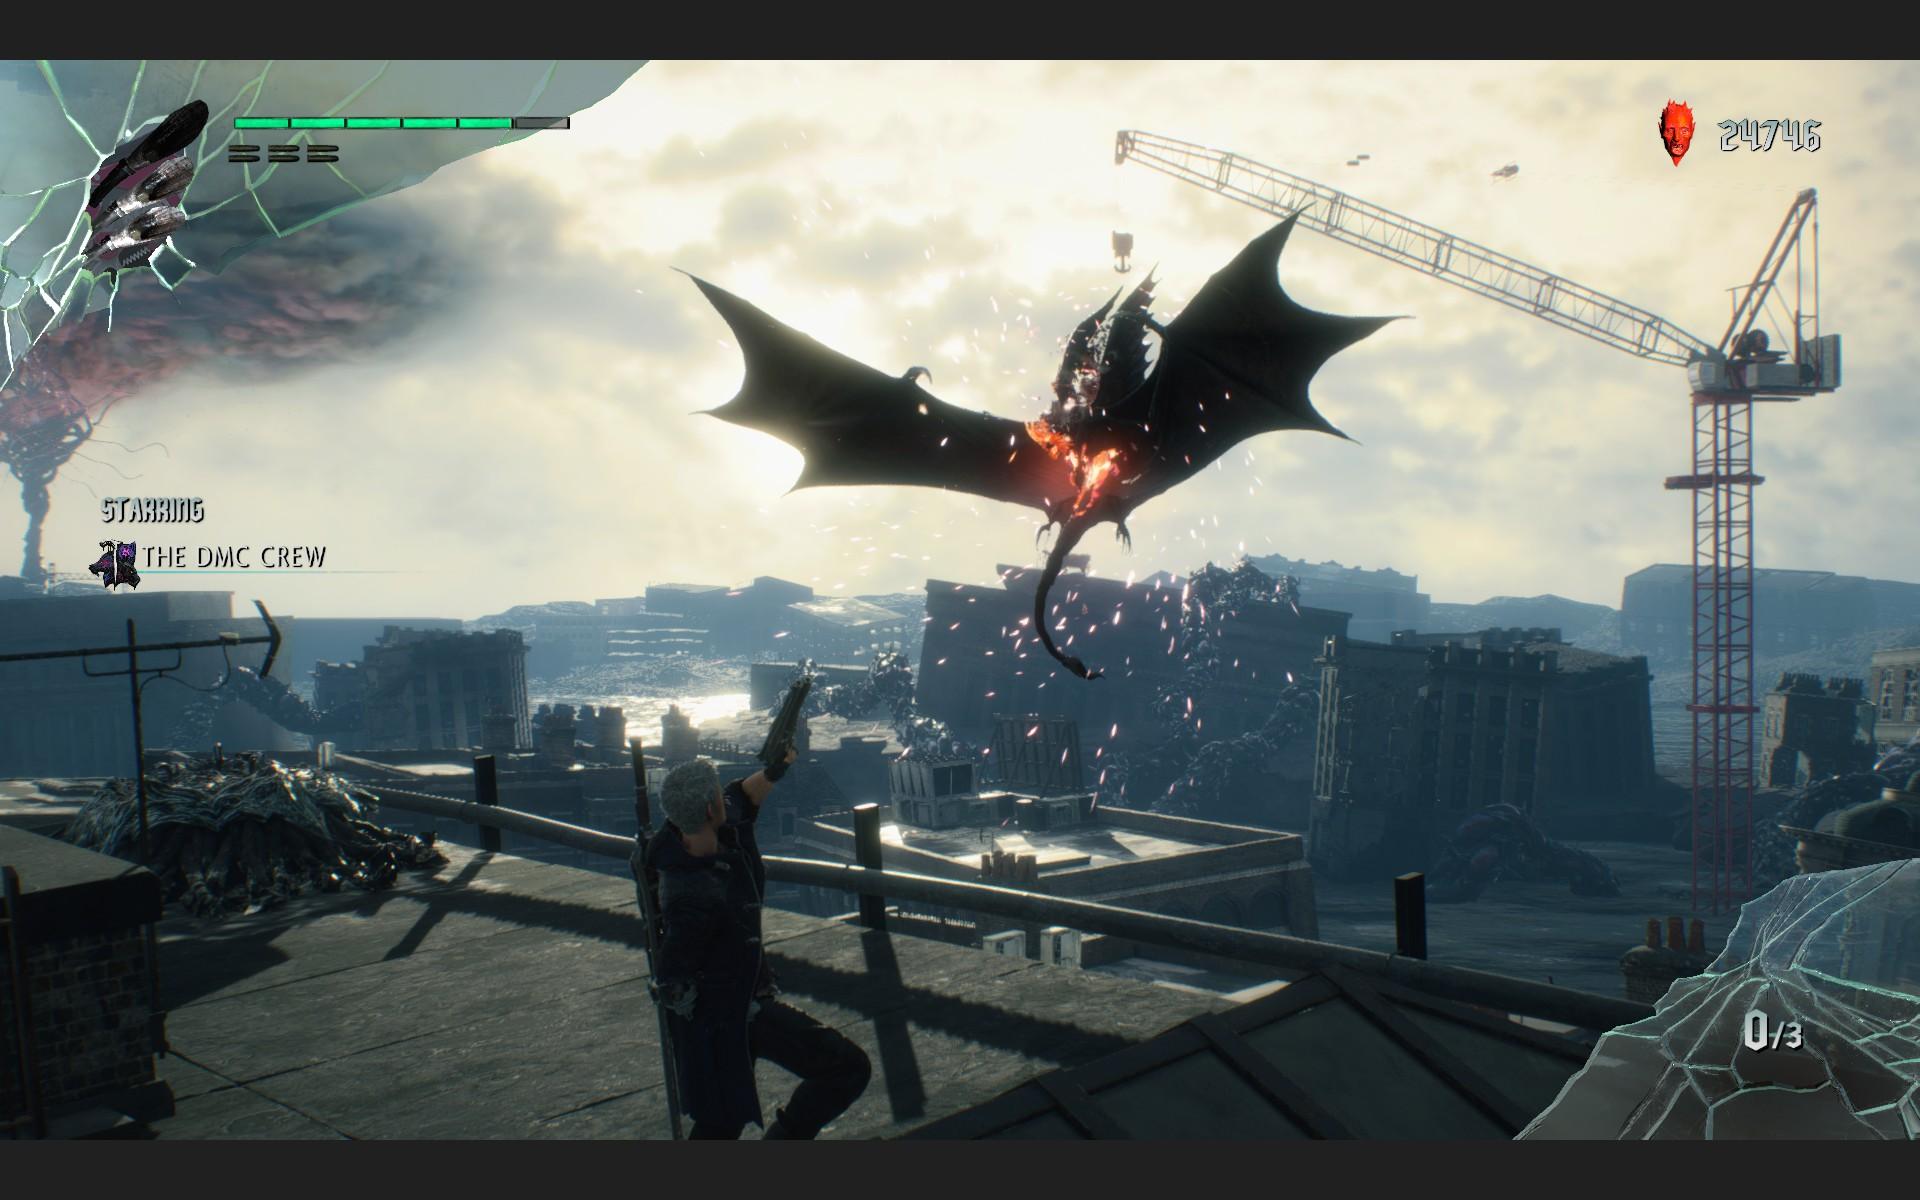 Атака на демонов: Обзор Devil May Cry 5